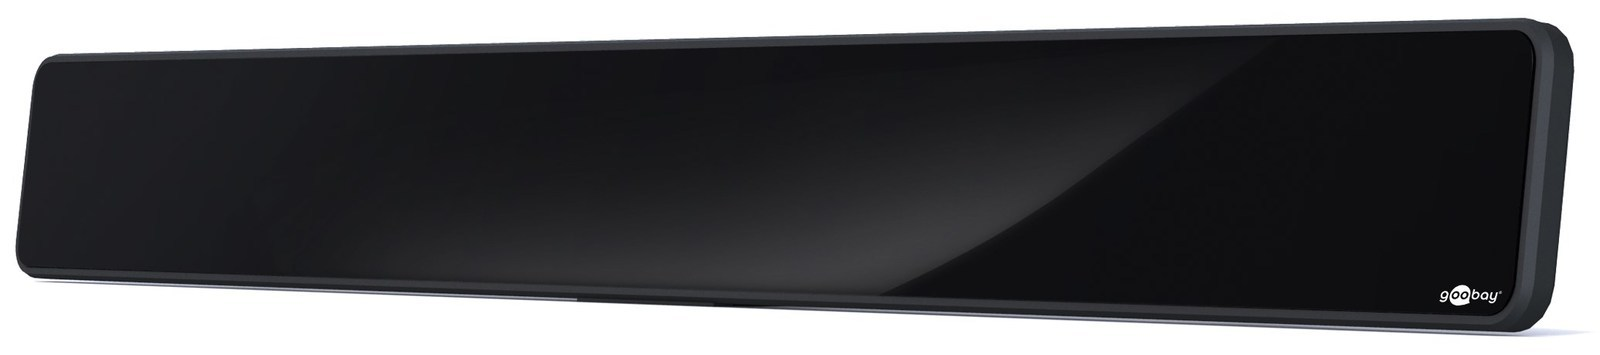 aktive dvb t zimmer antenne full hd schwarz netzteil vhf uhf 35db 30db dab radio ebay. Black Bedroom Furniture Sets. Home Design Ideas